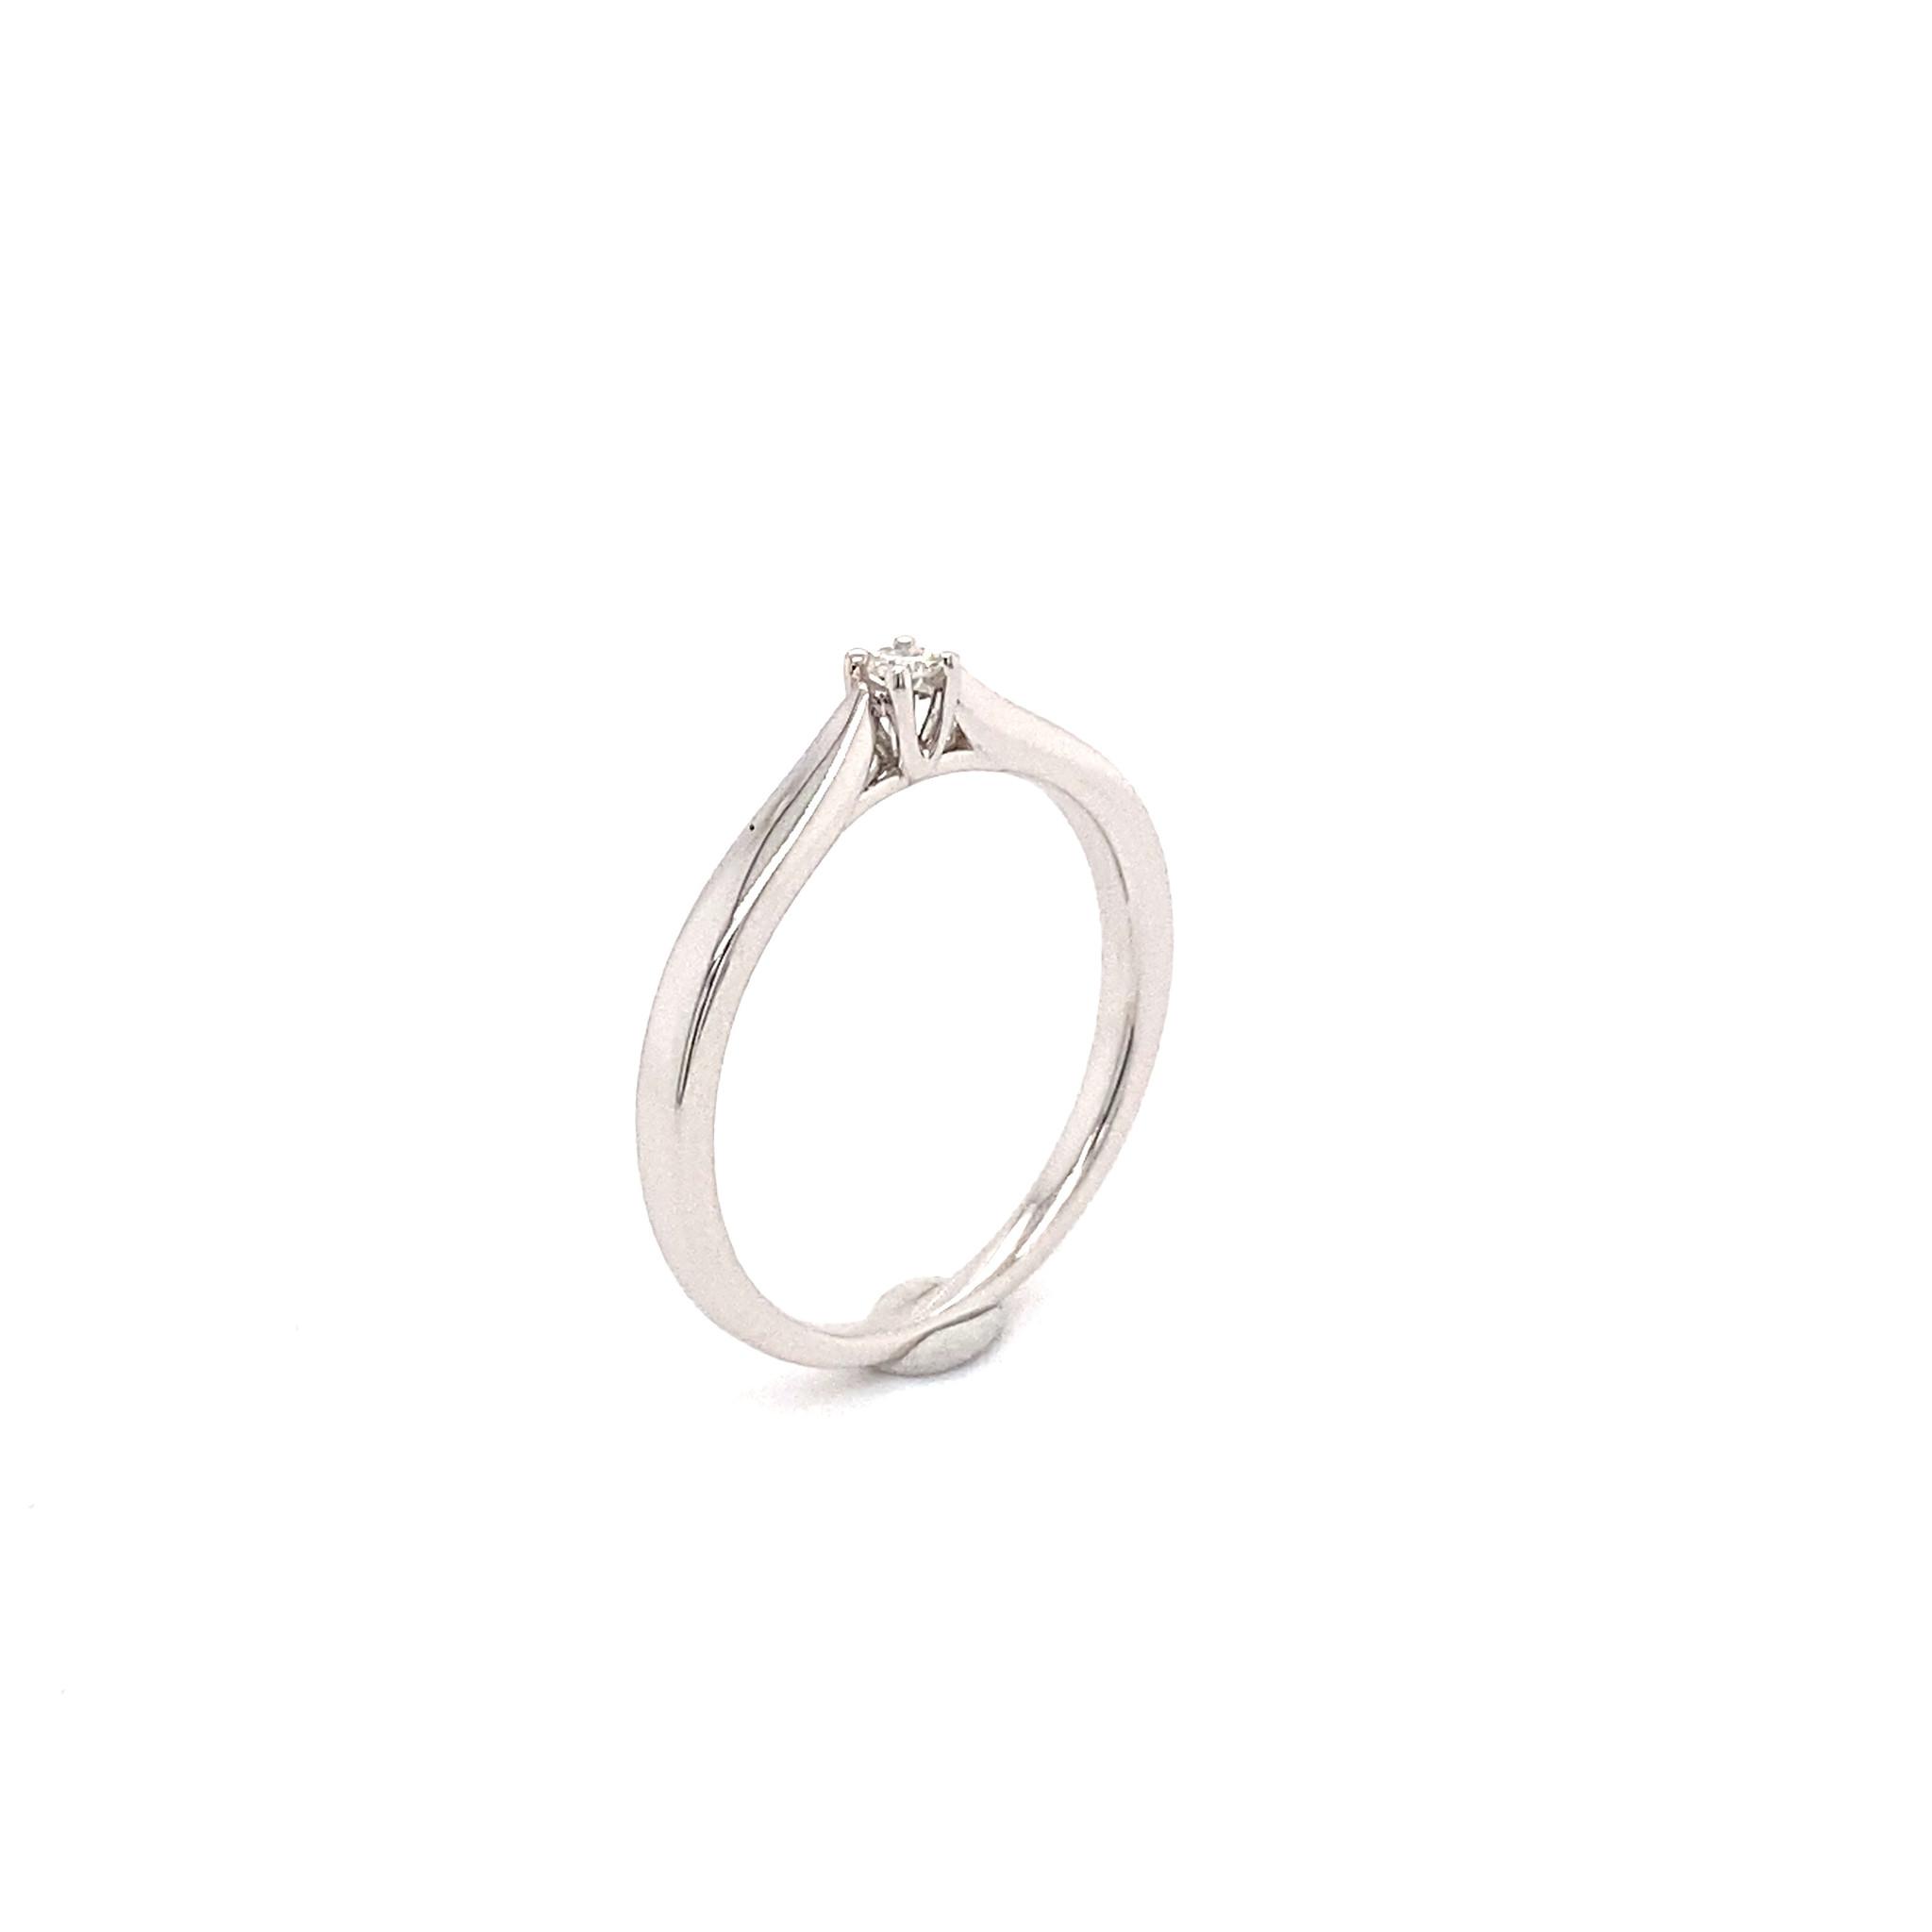 Private Label CvdK Private Label CvdK 14 krt. witgouden ring diamant